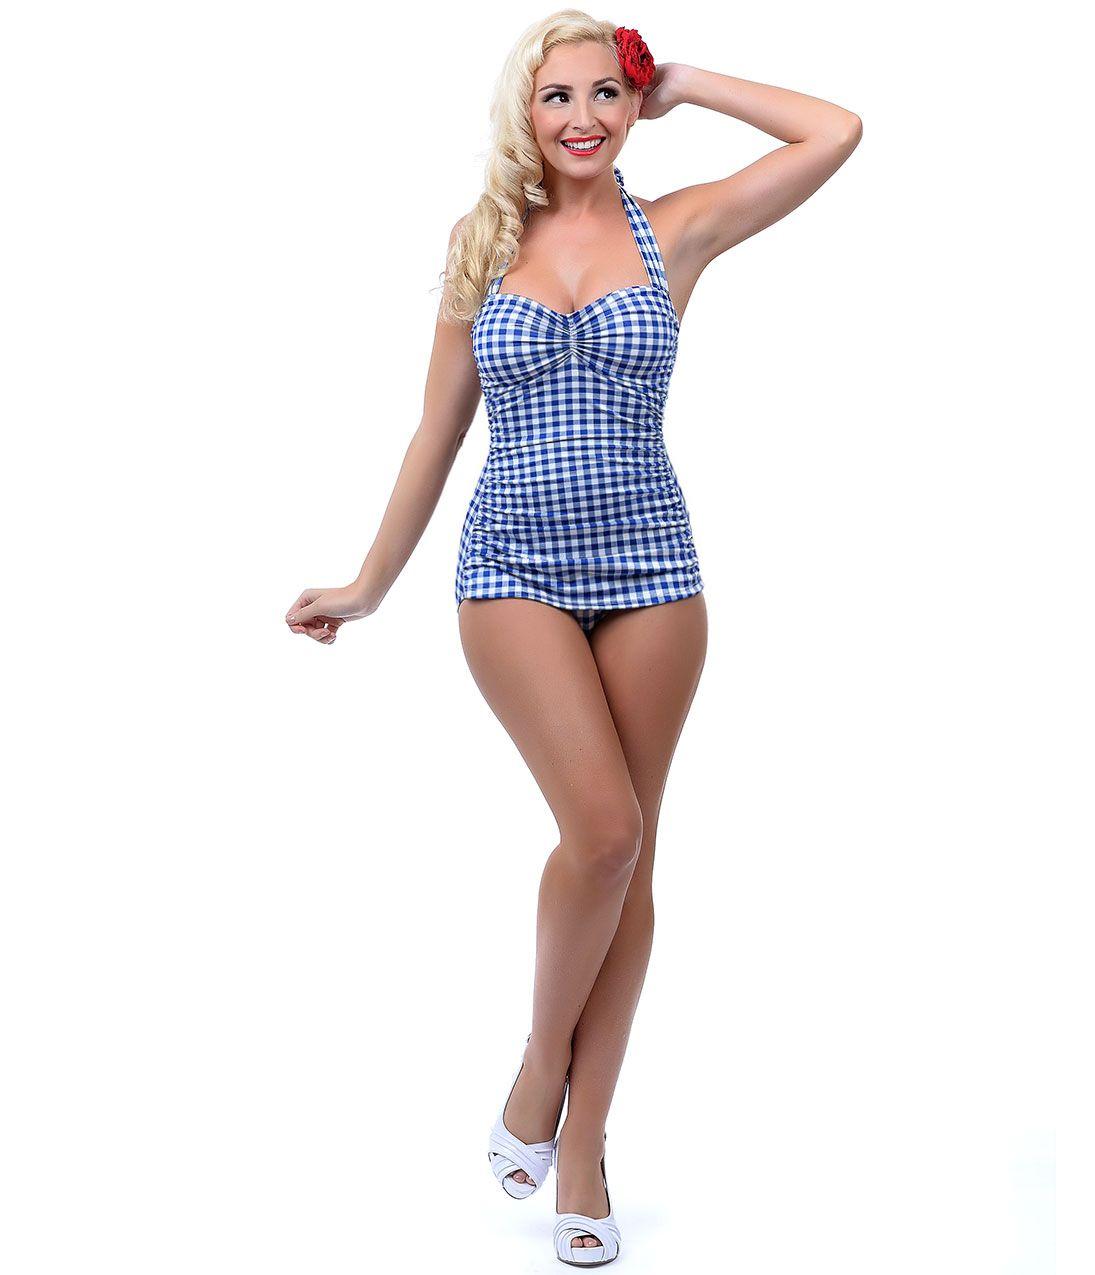 New Vintage Retro Swimsuits, Bathing Suits & Swimwear ...